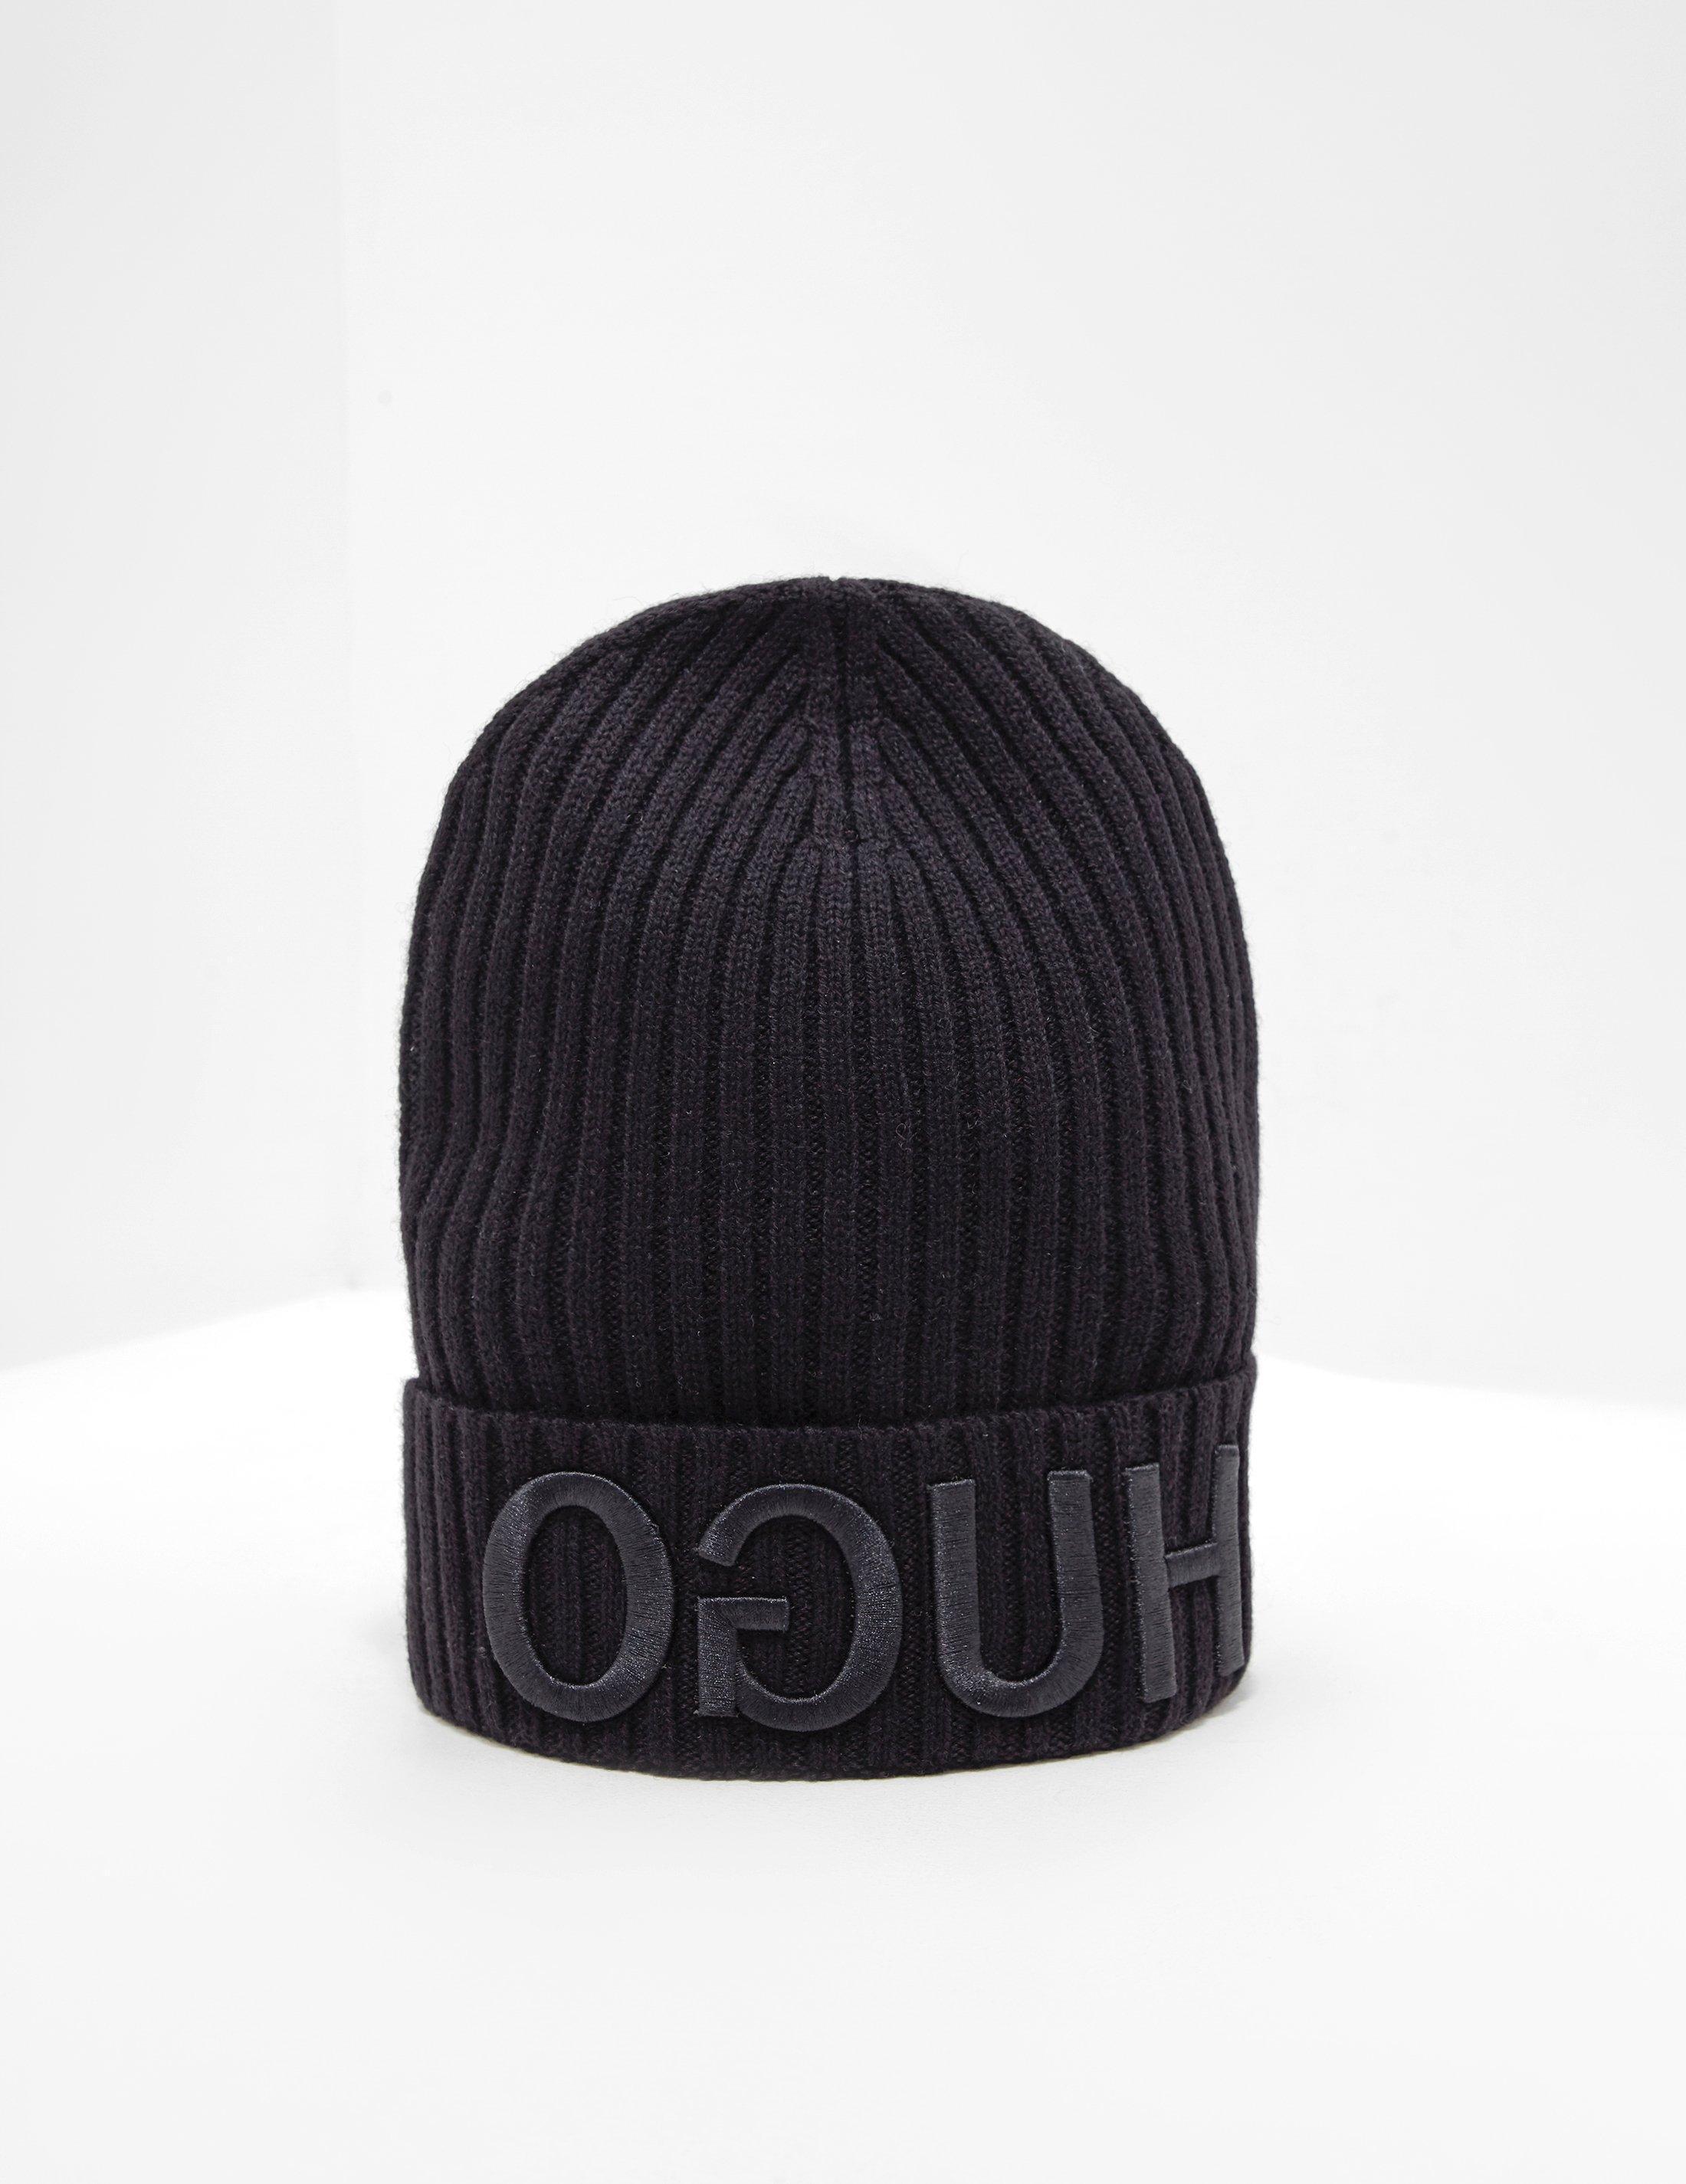 905c26a98ac HUGO Reverse Logo Beanie Black in Black for Men - Save 18% - Lyst